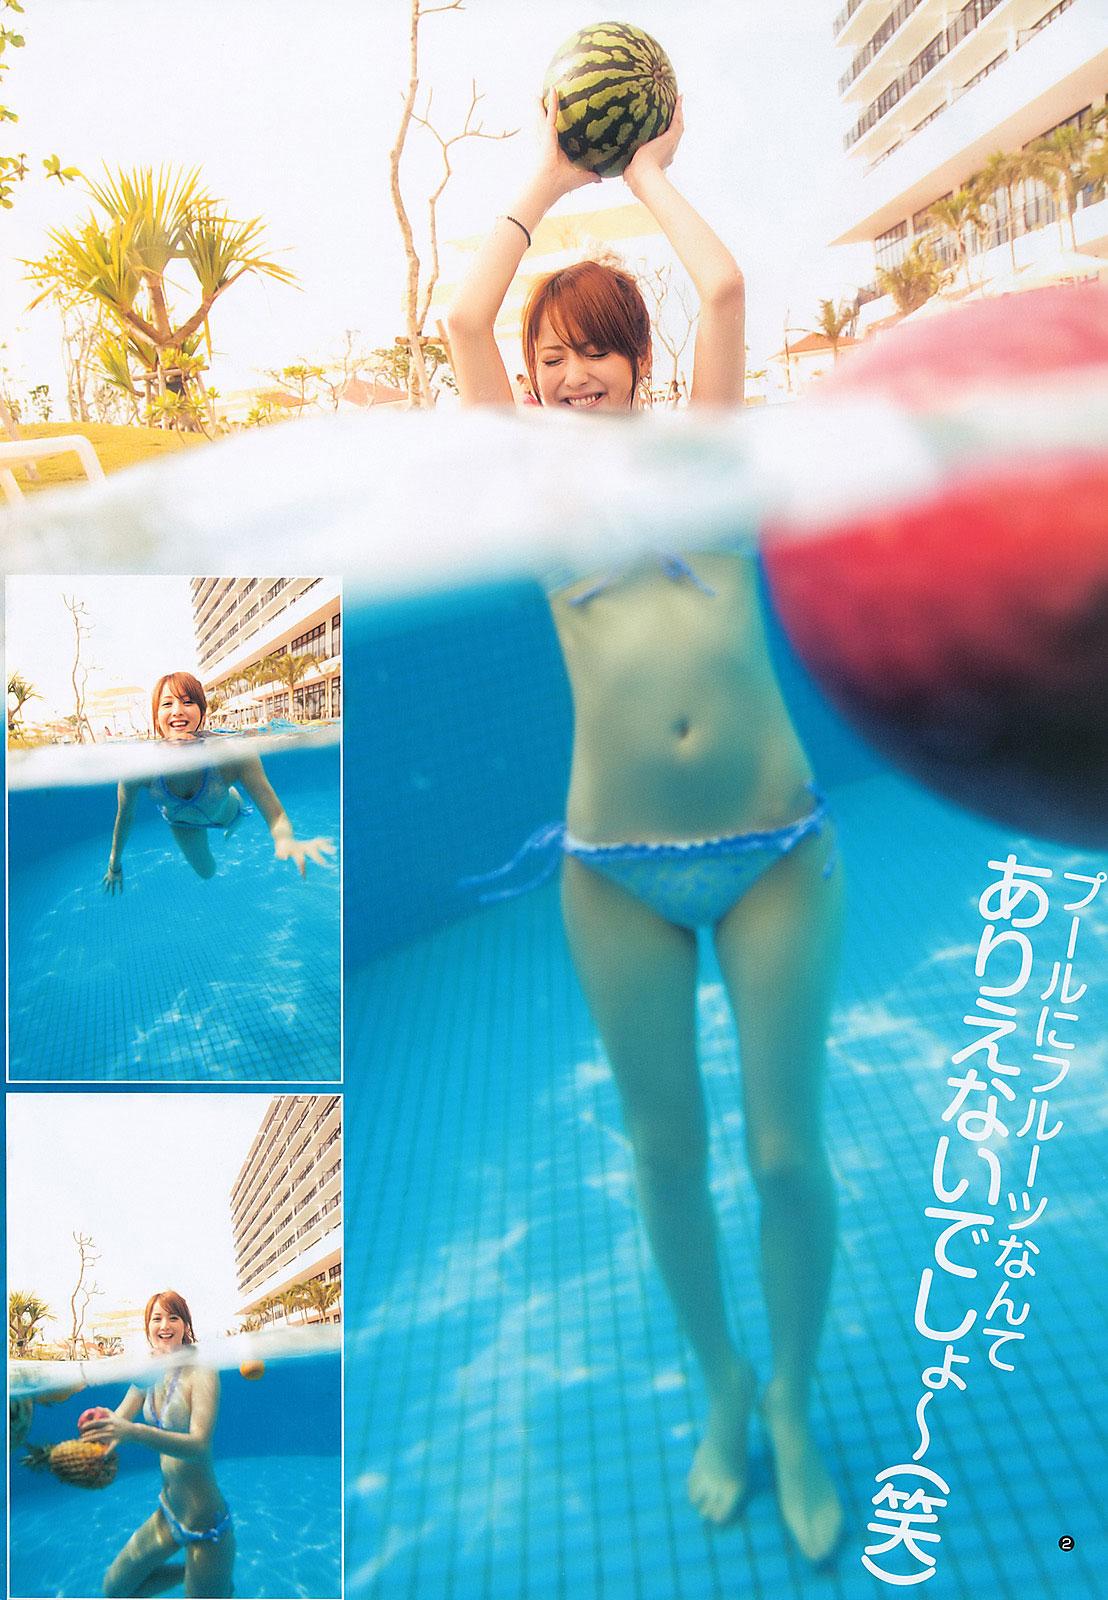 Nozomi Sasaki bikini photo book